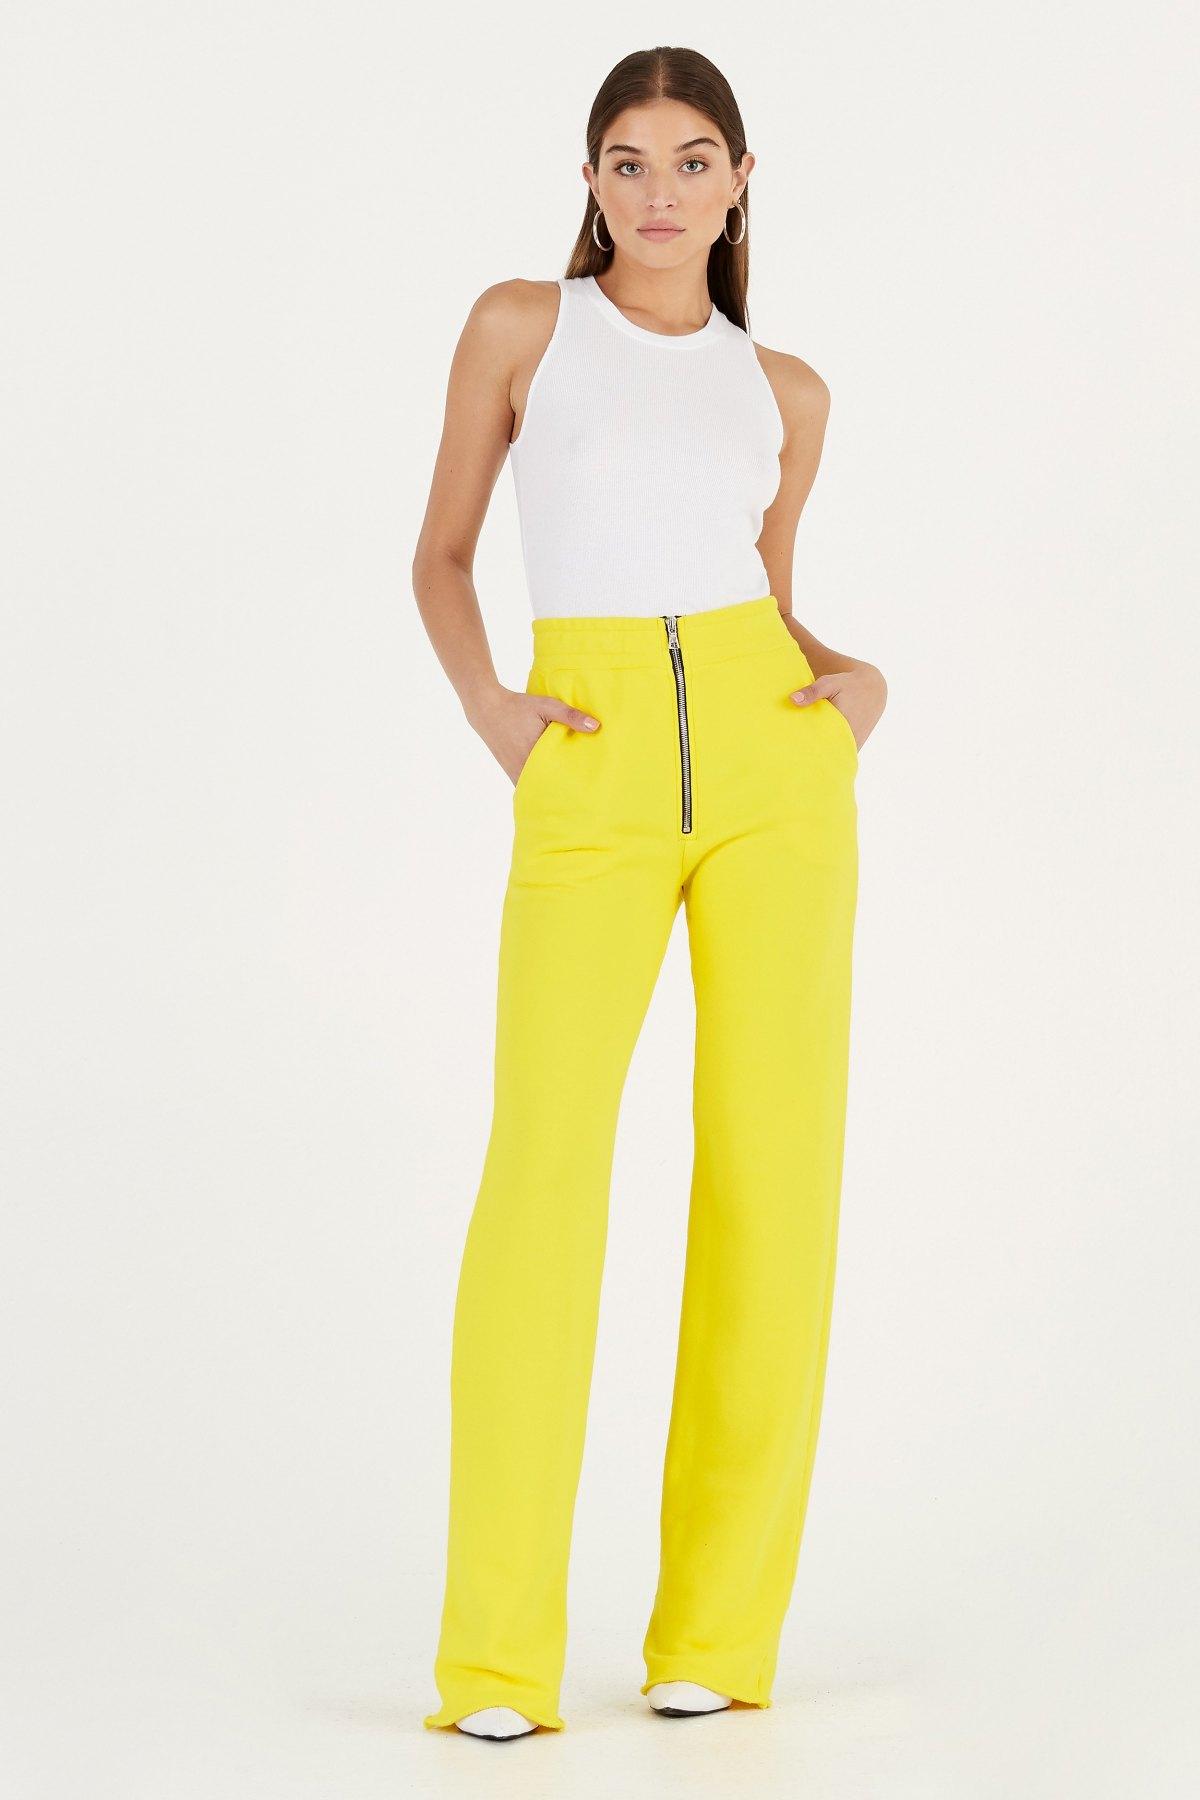 Manhattan trouser by Cotton Citizen, available on cottoncitizen.com for $225 Hailey Baldwin Pants Exact Product